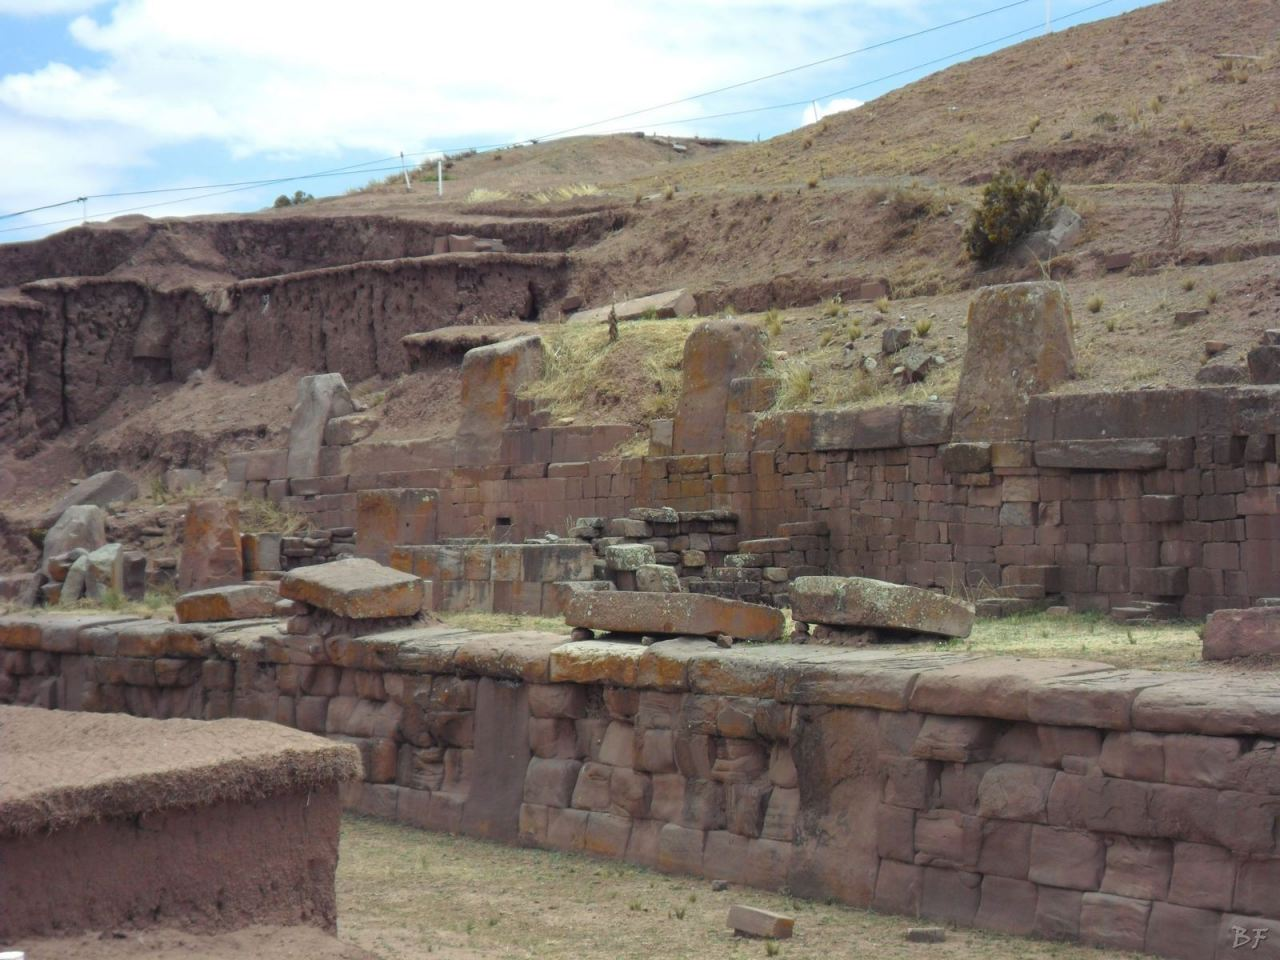 Sito-Megalitico-Piramide-Akapana-Kalasasaya-Menhir-Tiahuanaco-Bolivia-106